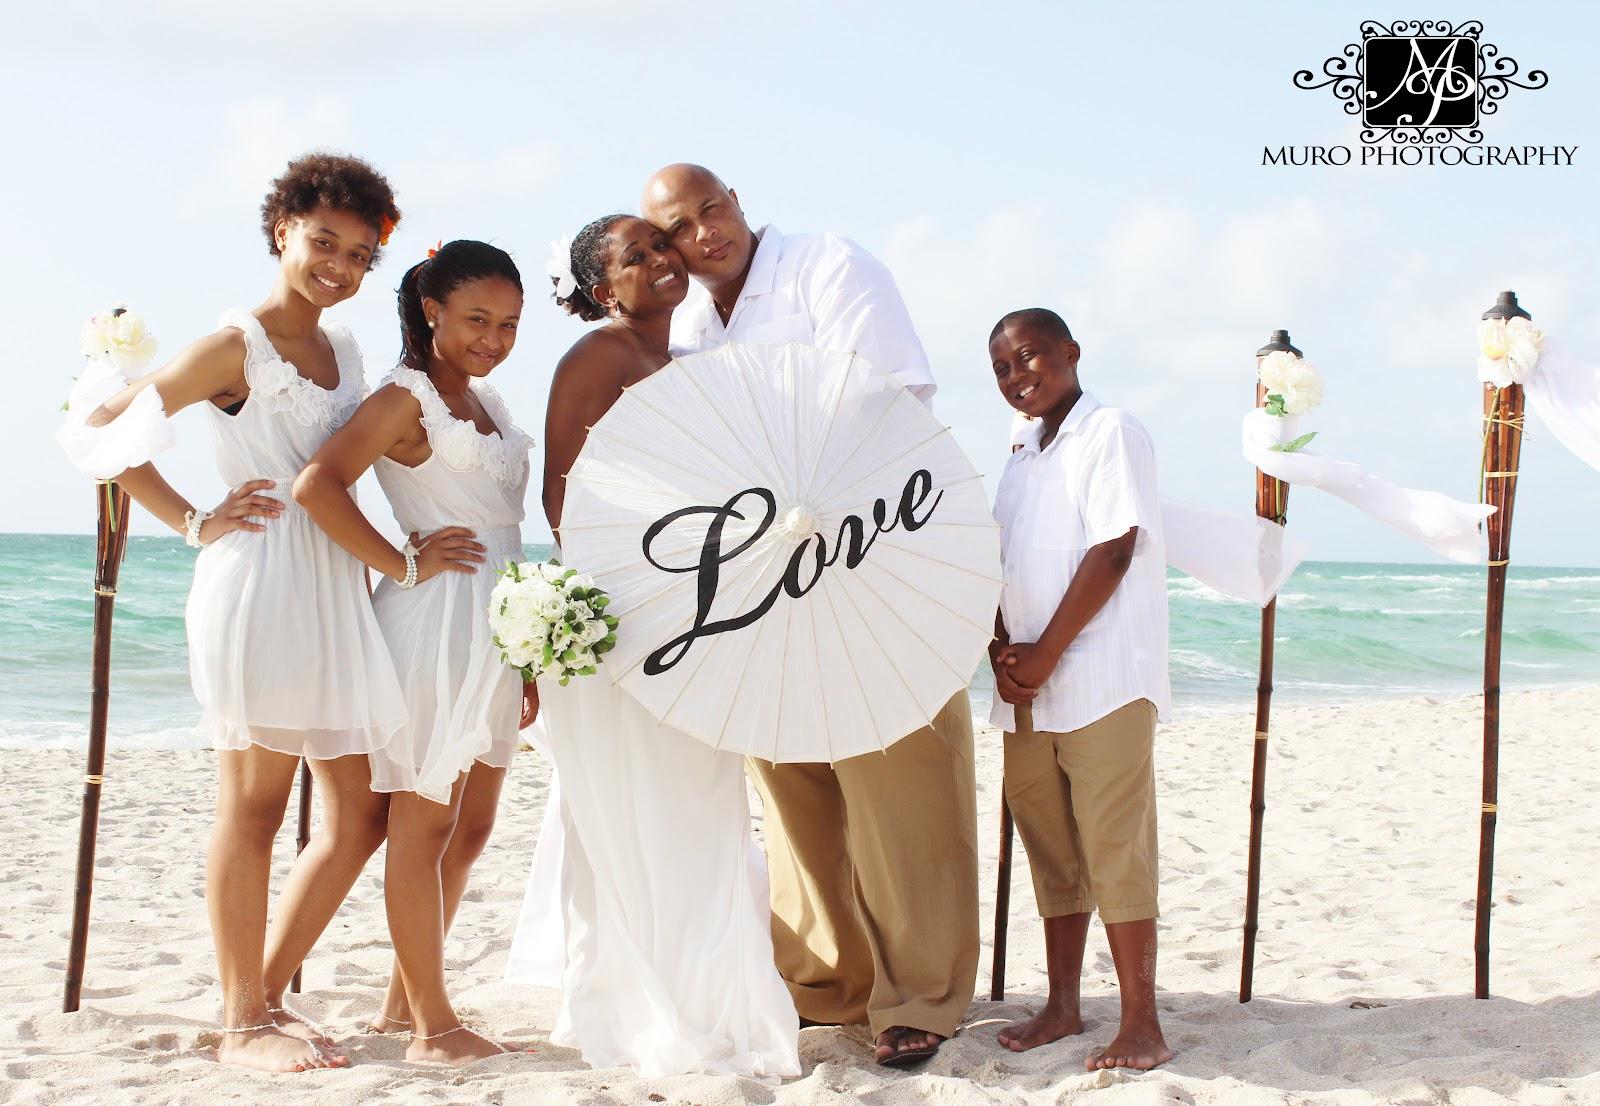 Affordable Beach Weddings 305 793 4387 Miami Beach Vow Renewal